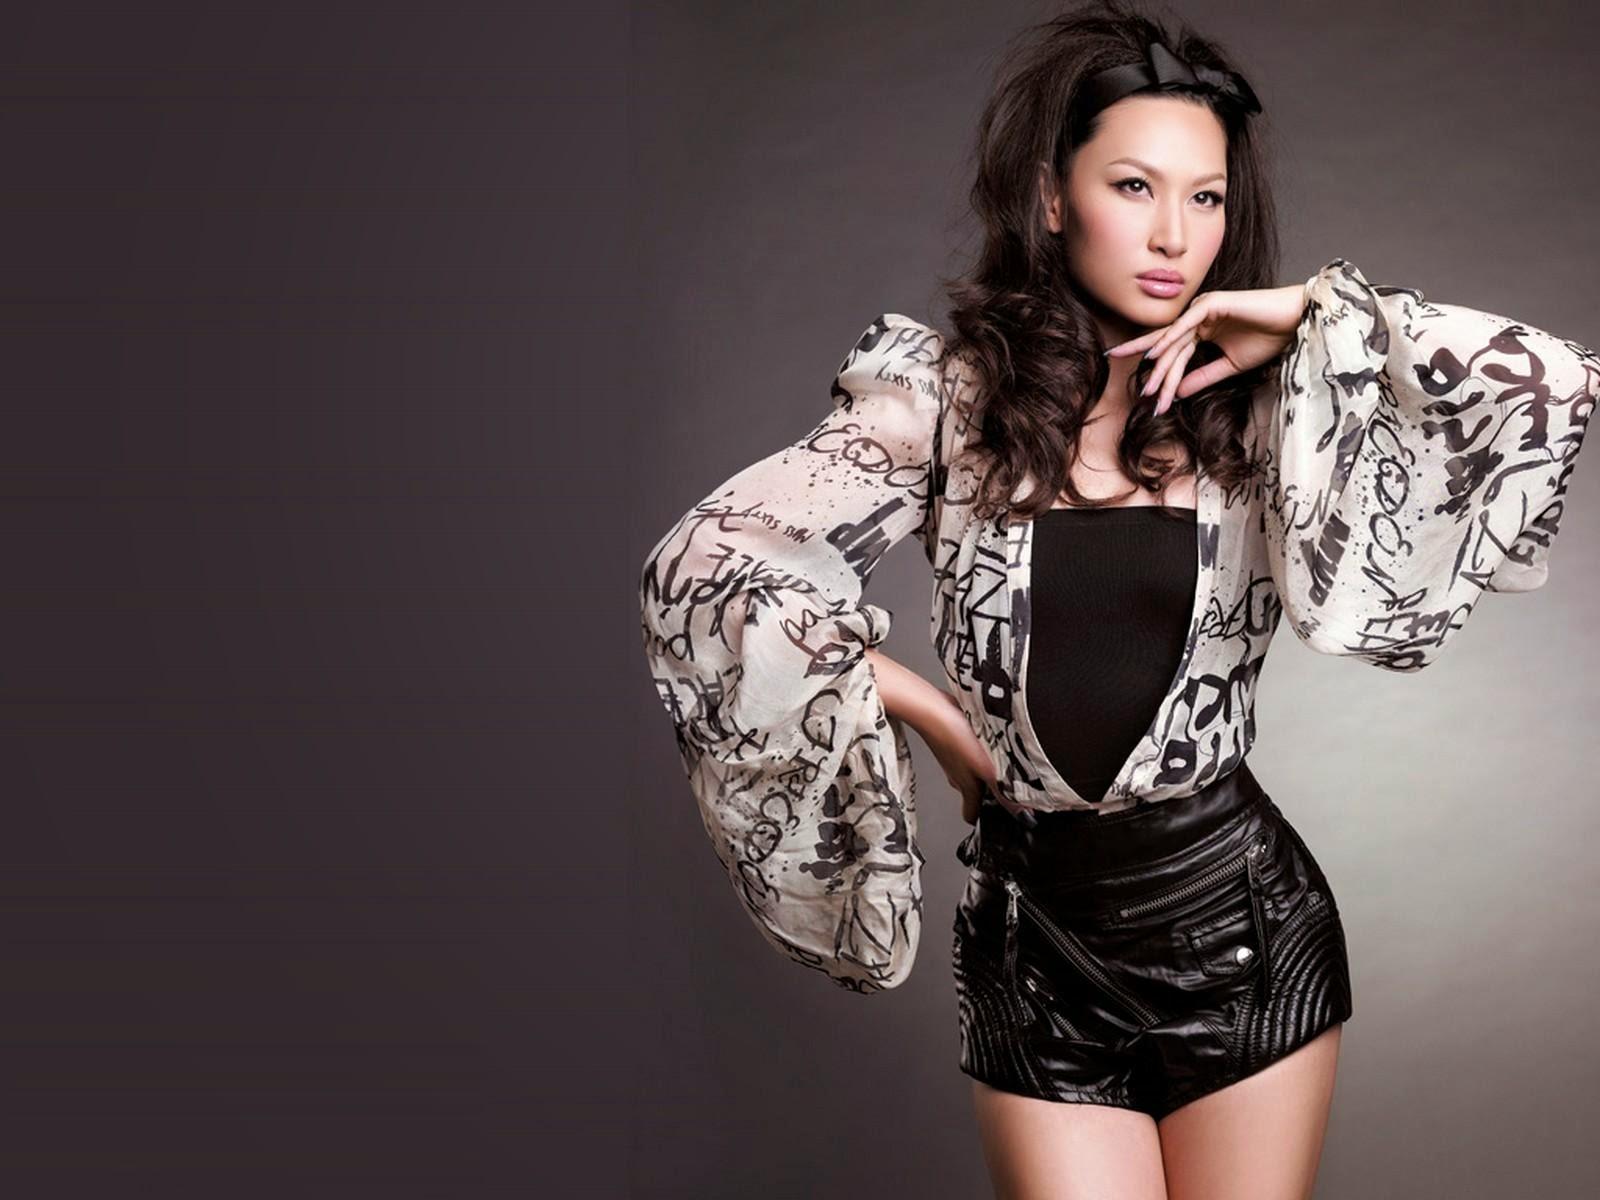 Kate Tsui Hd Wallpapers Free Download